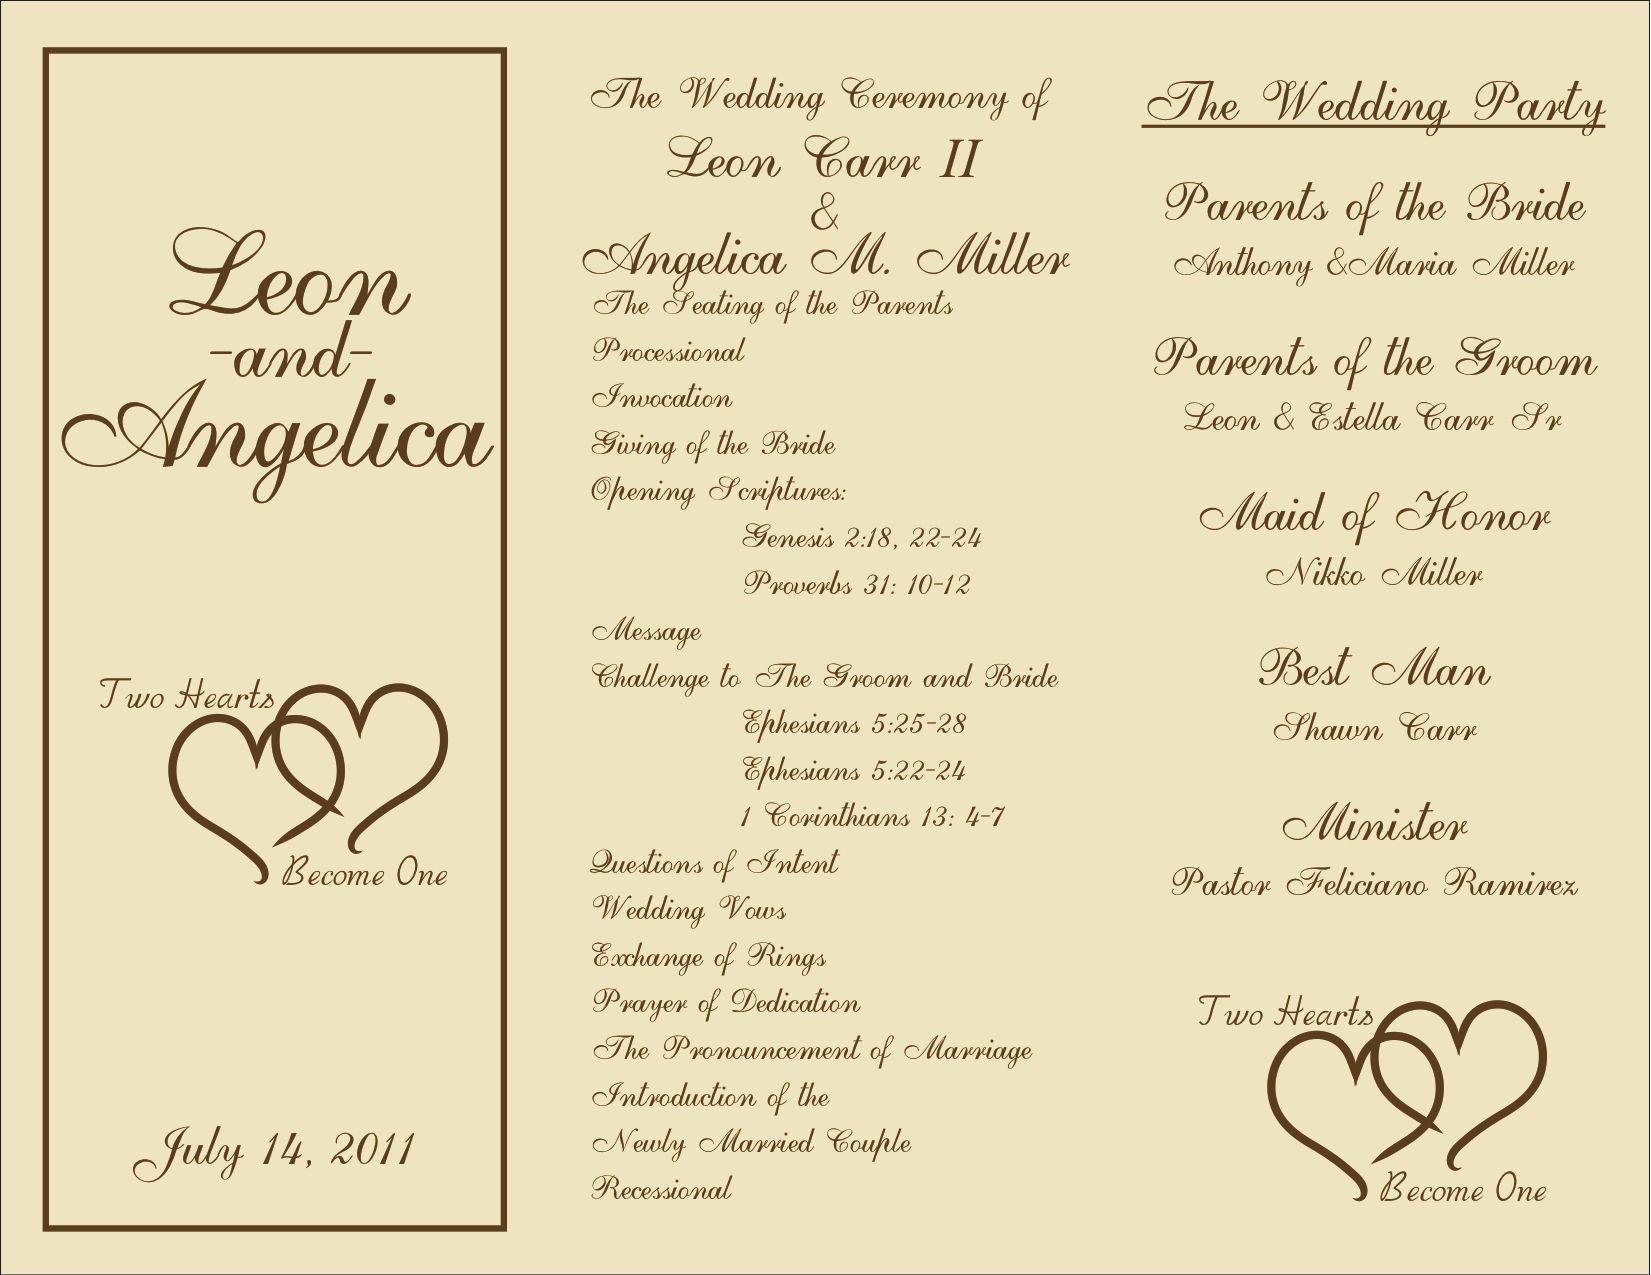 Free Printable Wedding Programs Templates | : Sample Wedding - Free Printable Wedding Programs